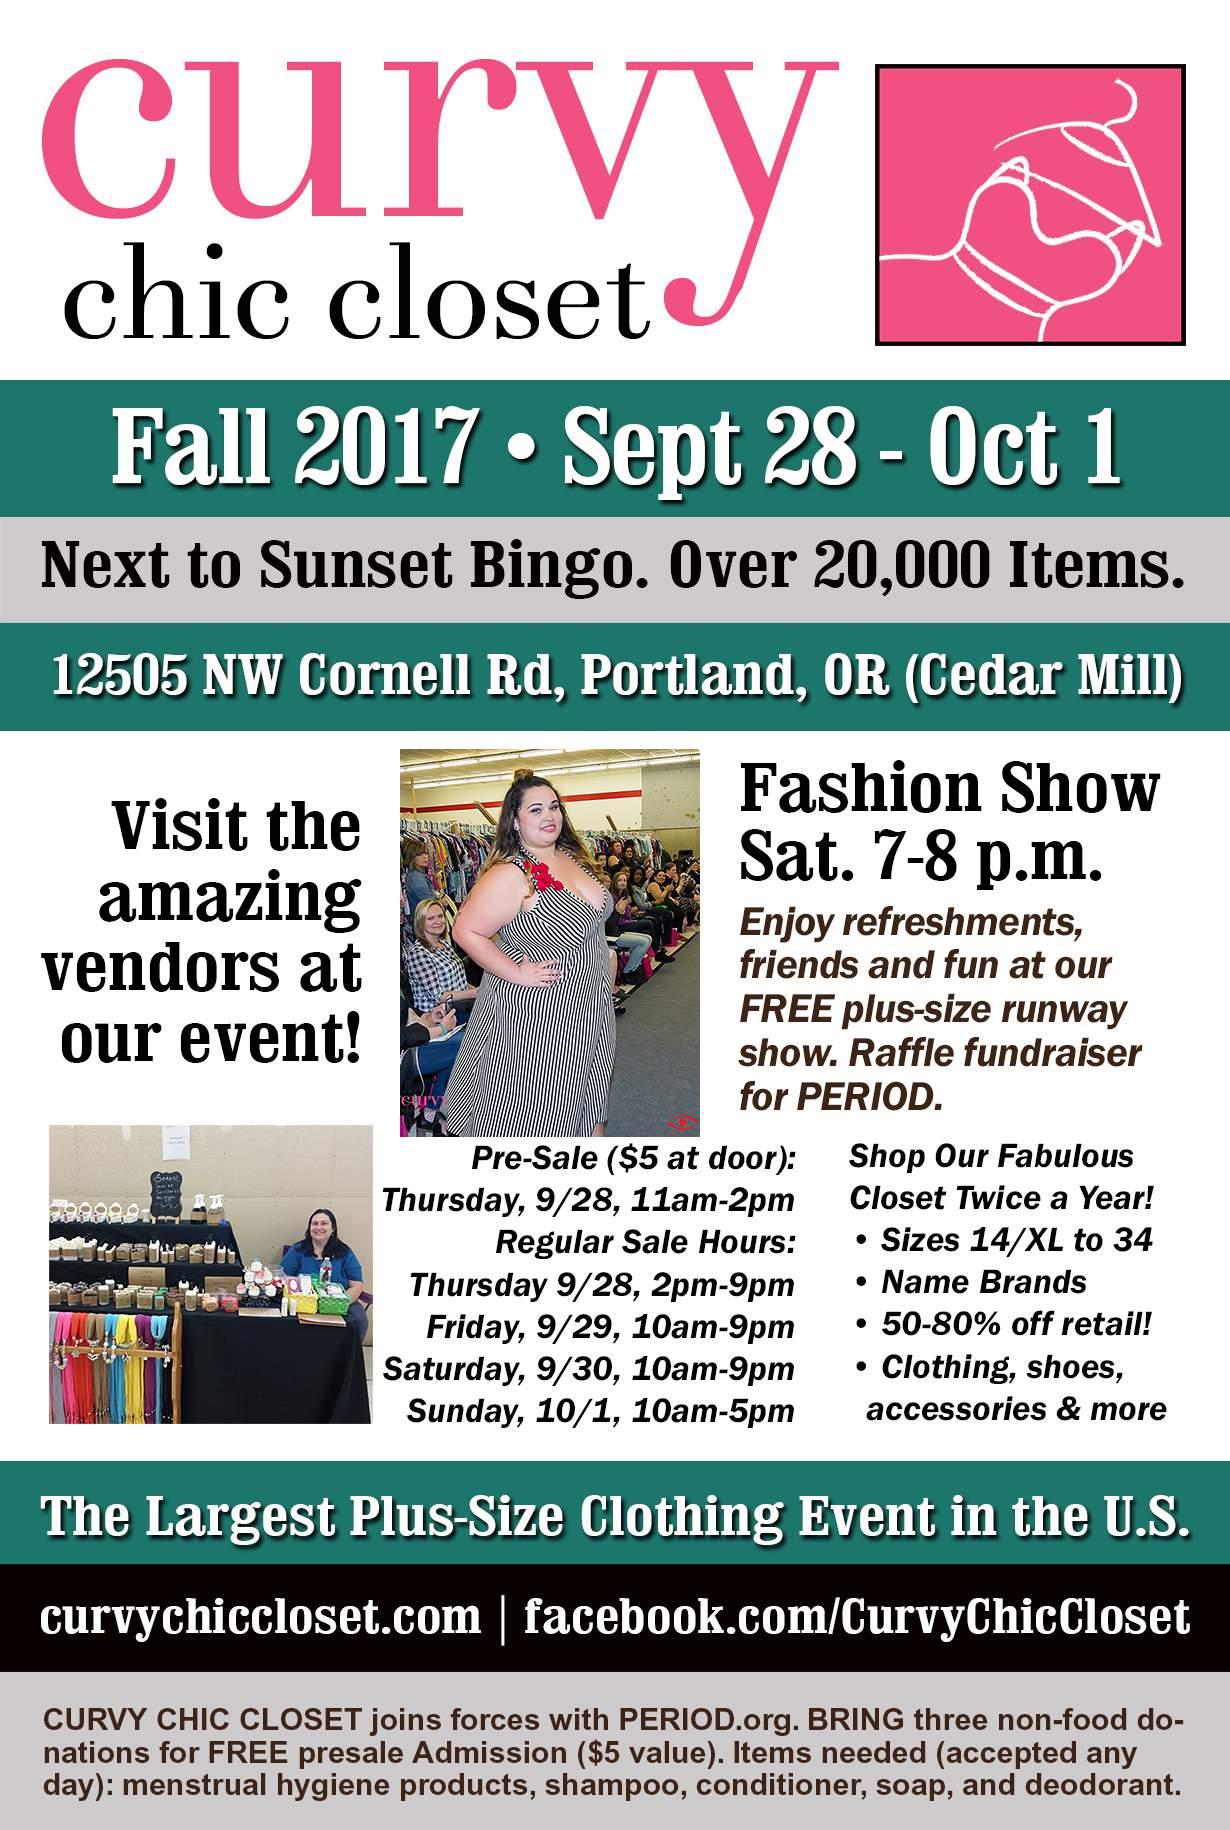 plus size events, Curvy Chic Closet Event, plus size event calendar, Oregon Events, curvy events